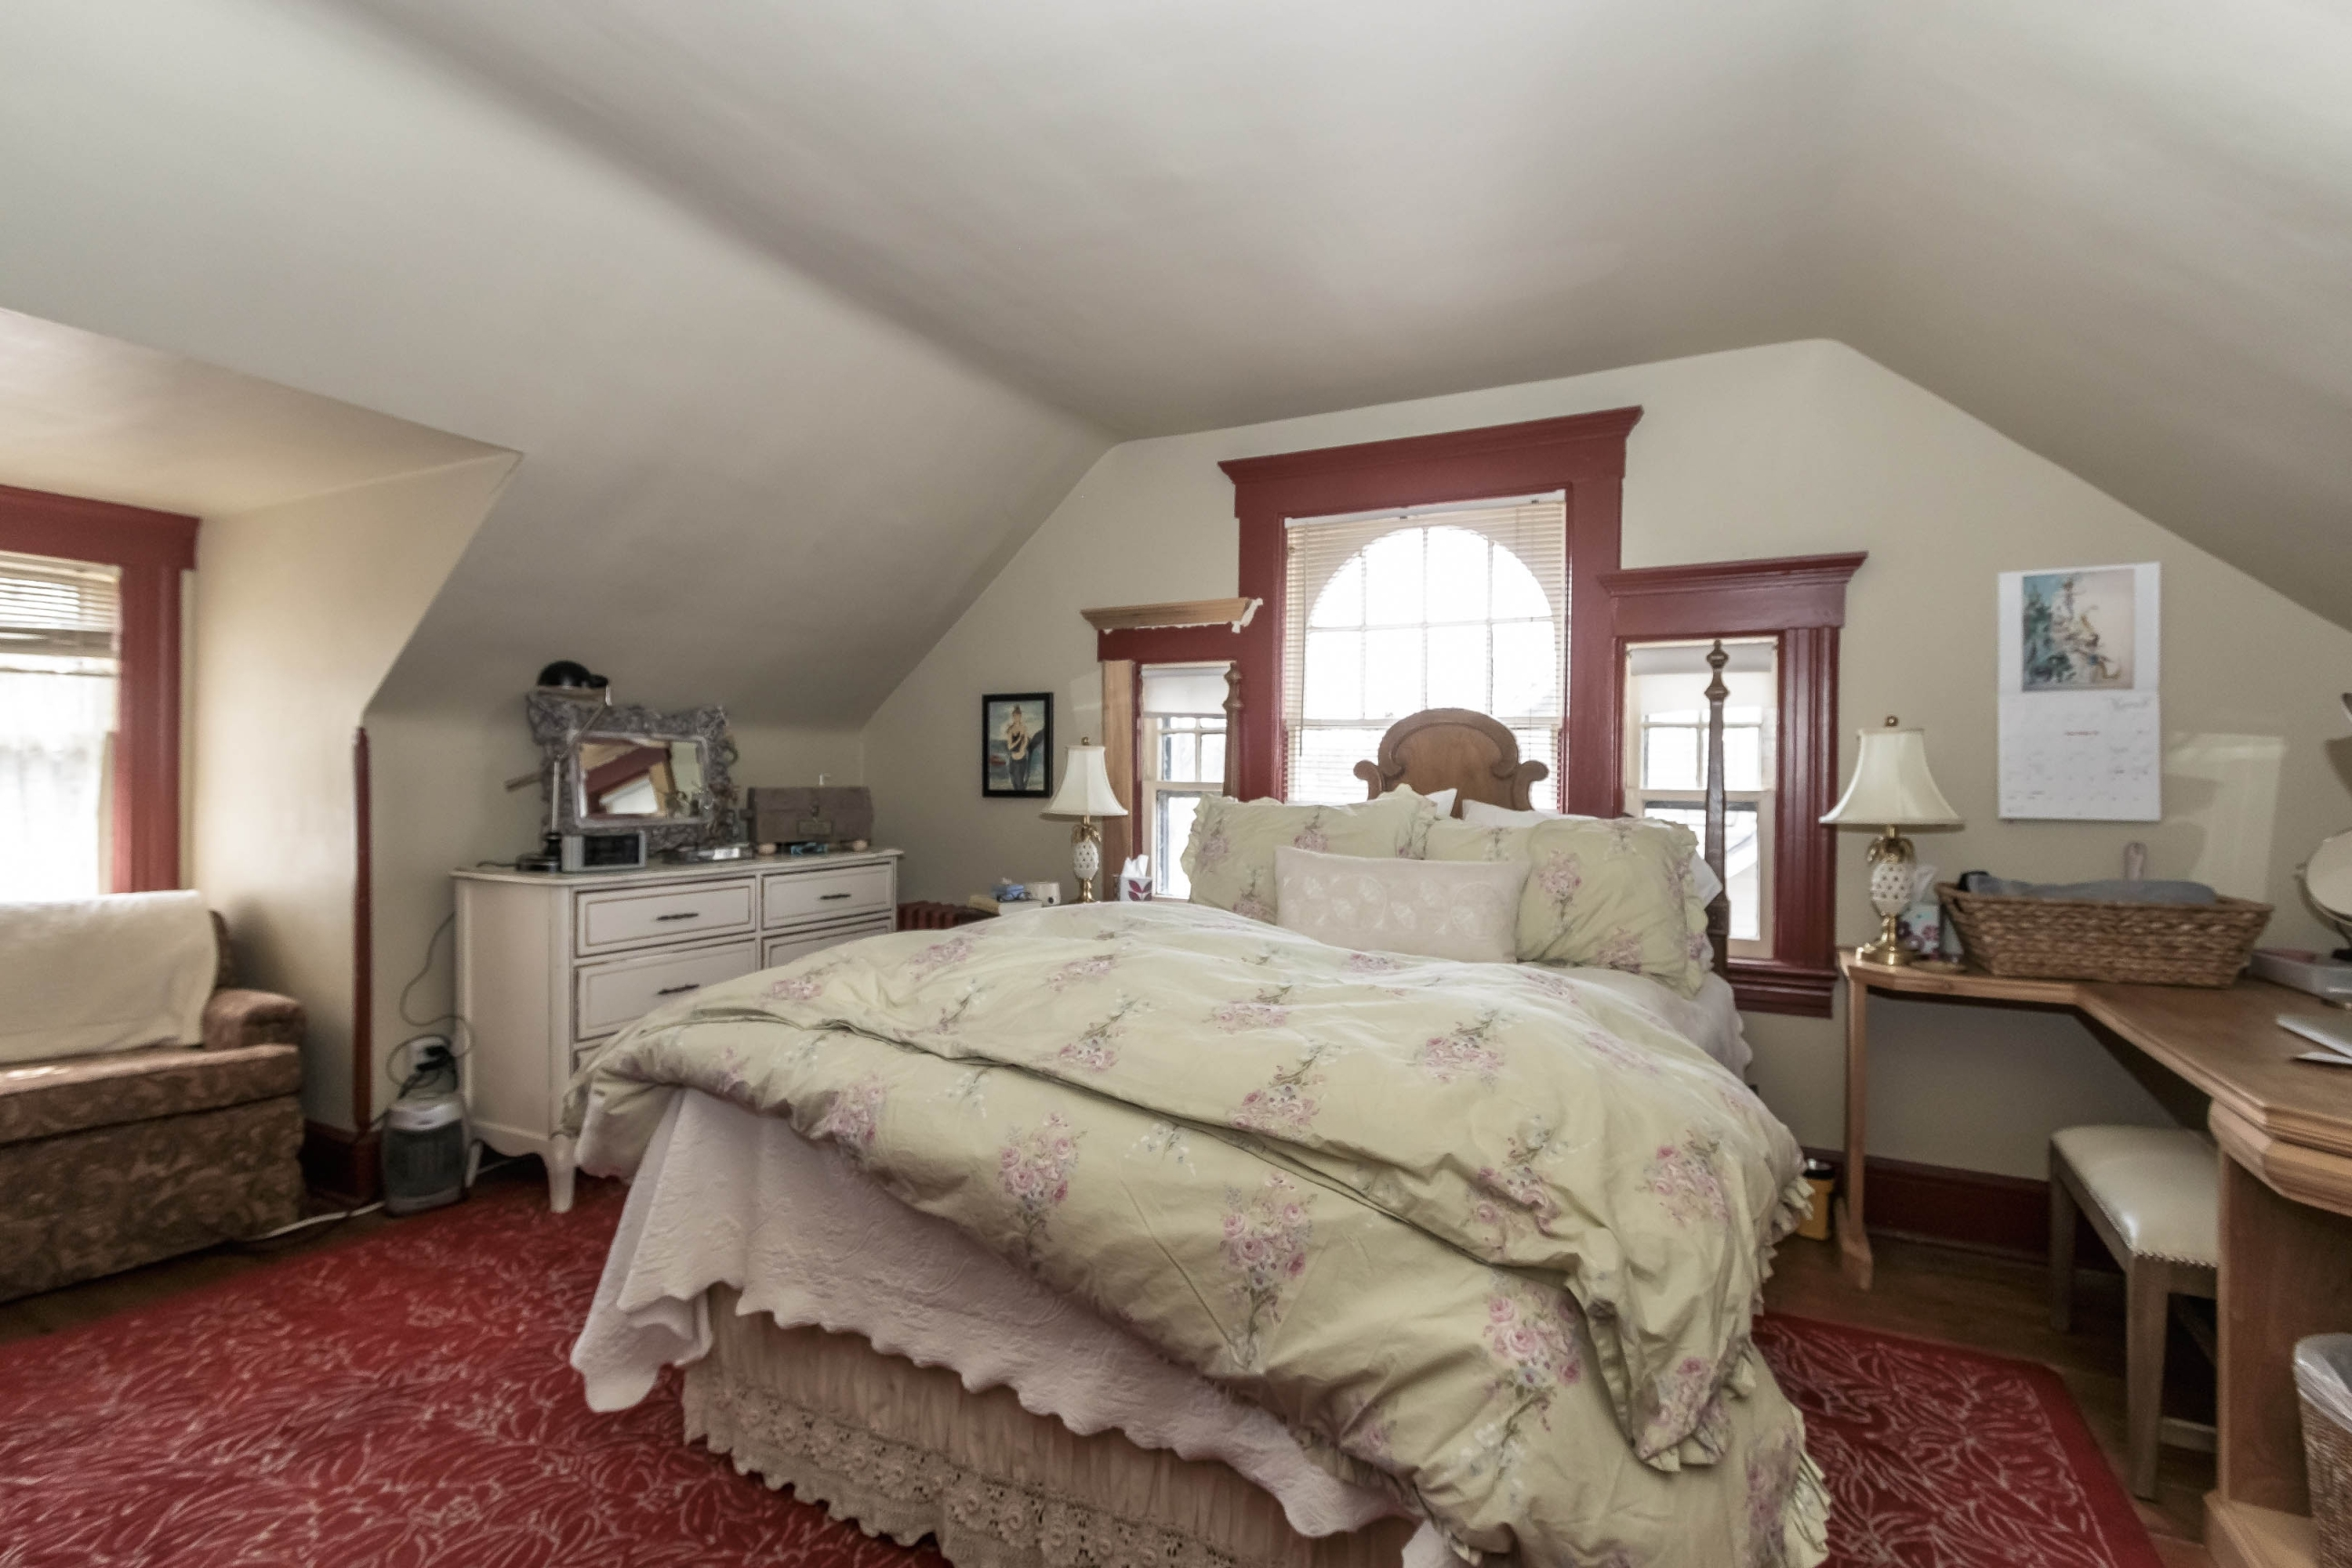 Before – Original Master Bedroom